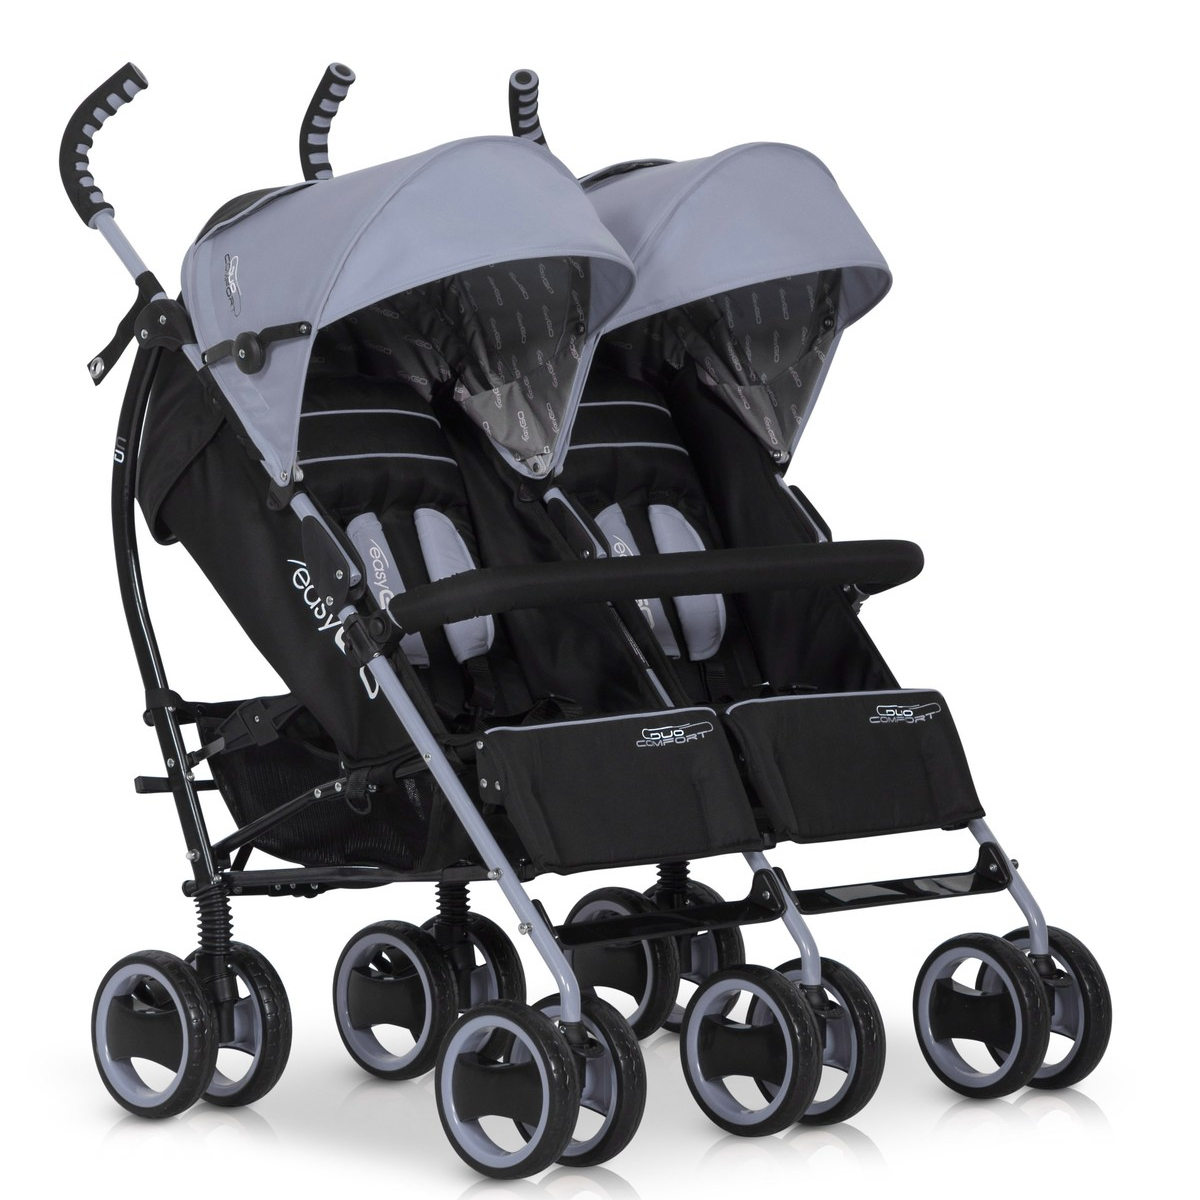 EASYGO DUO COMFORT 2016 Wózek spacerowy dla bliźniąt